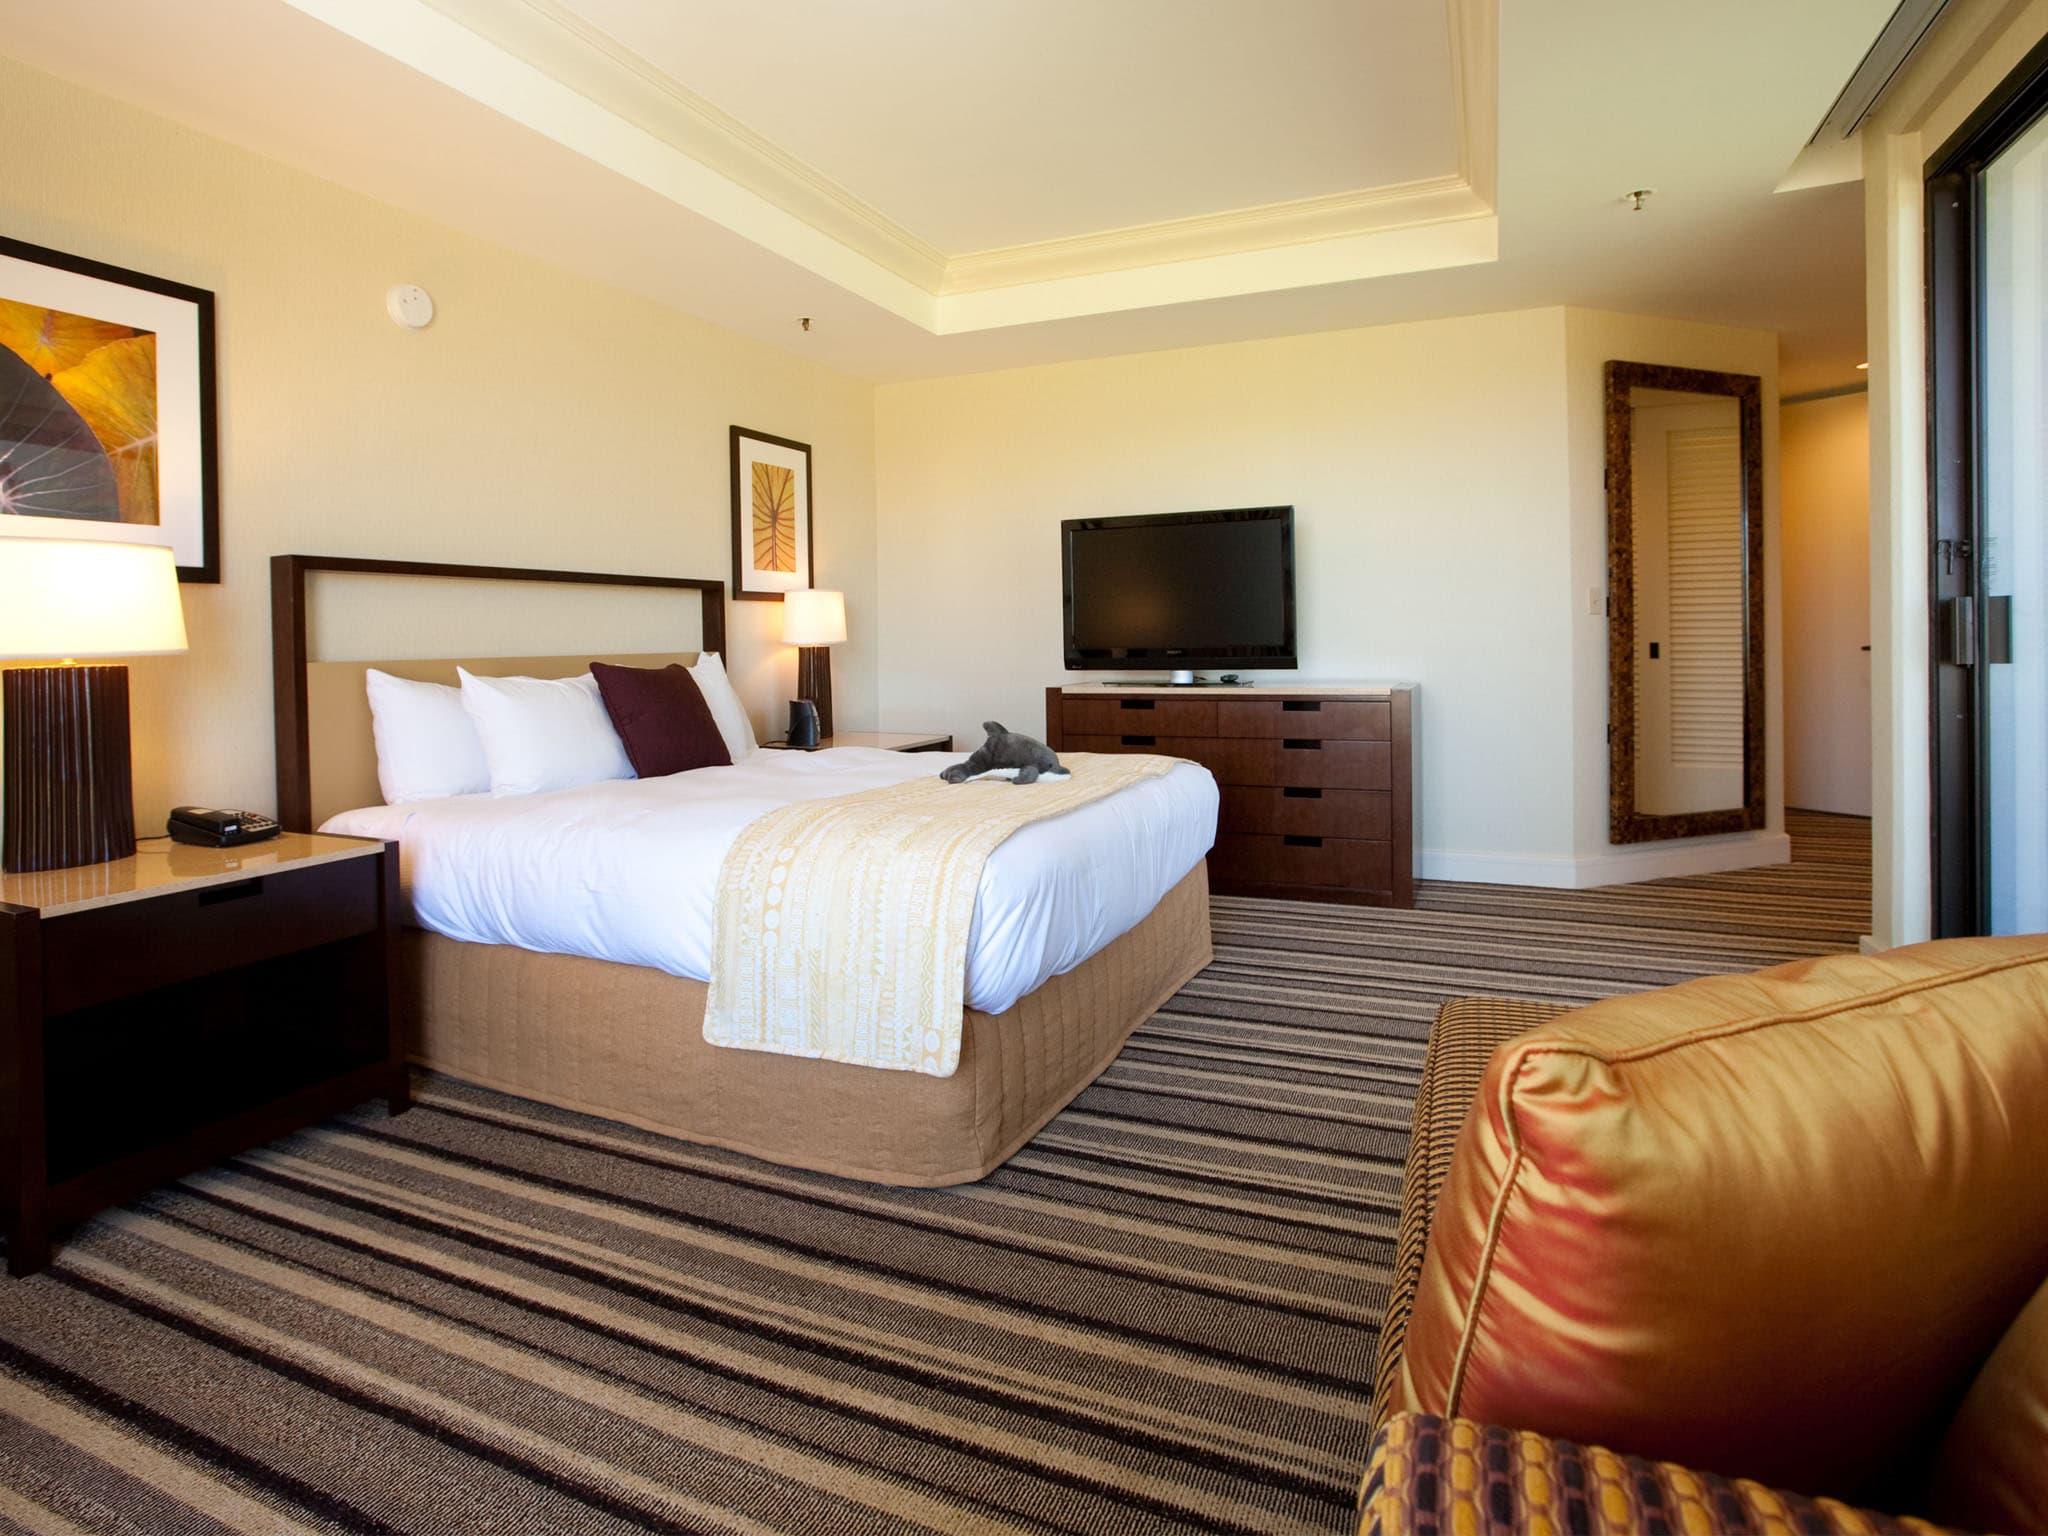 Photos of Rooms  Suites at Hilton Waikoloa Village